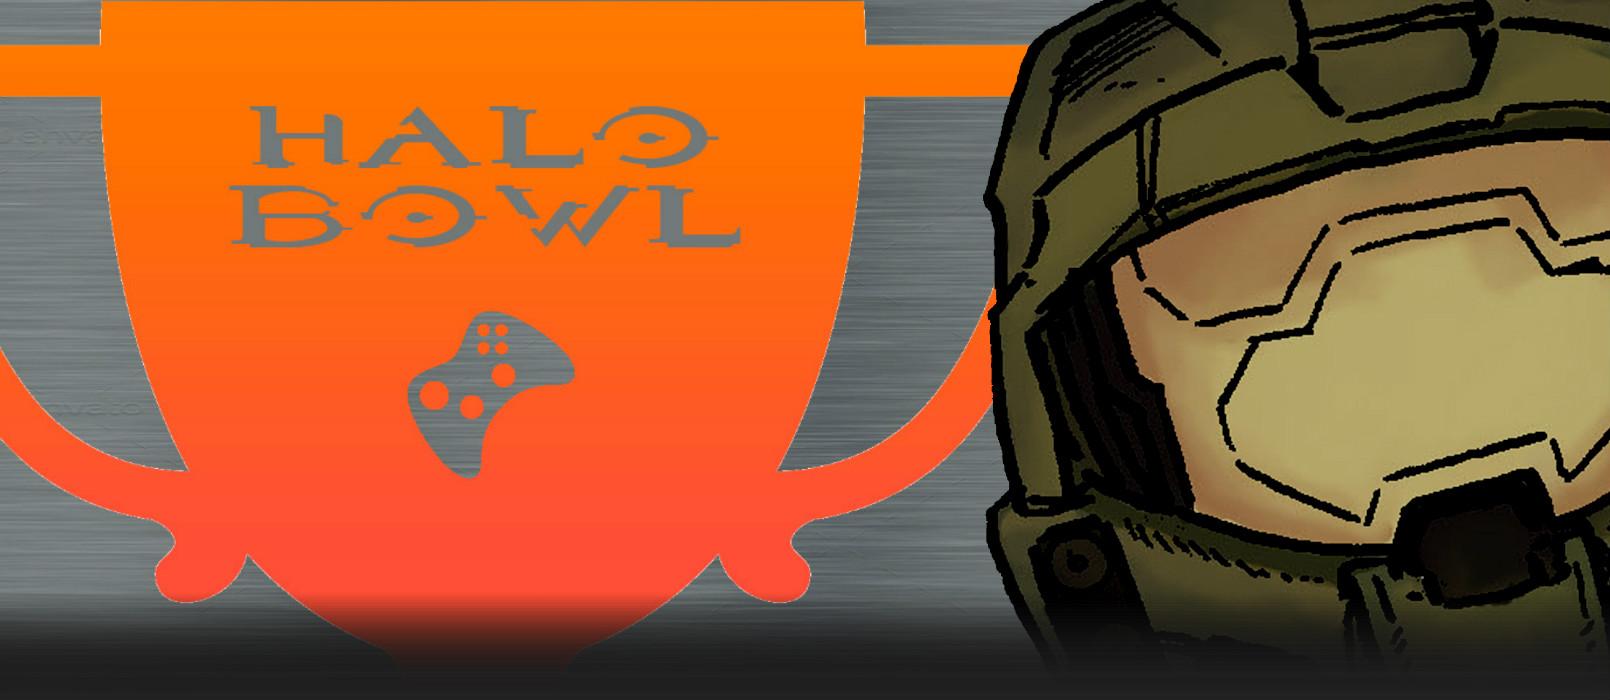 Halo Bowl • 2018 - December 16th, 2018 @ 5:00 PM EST